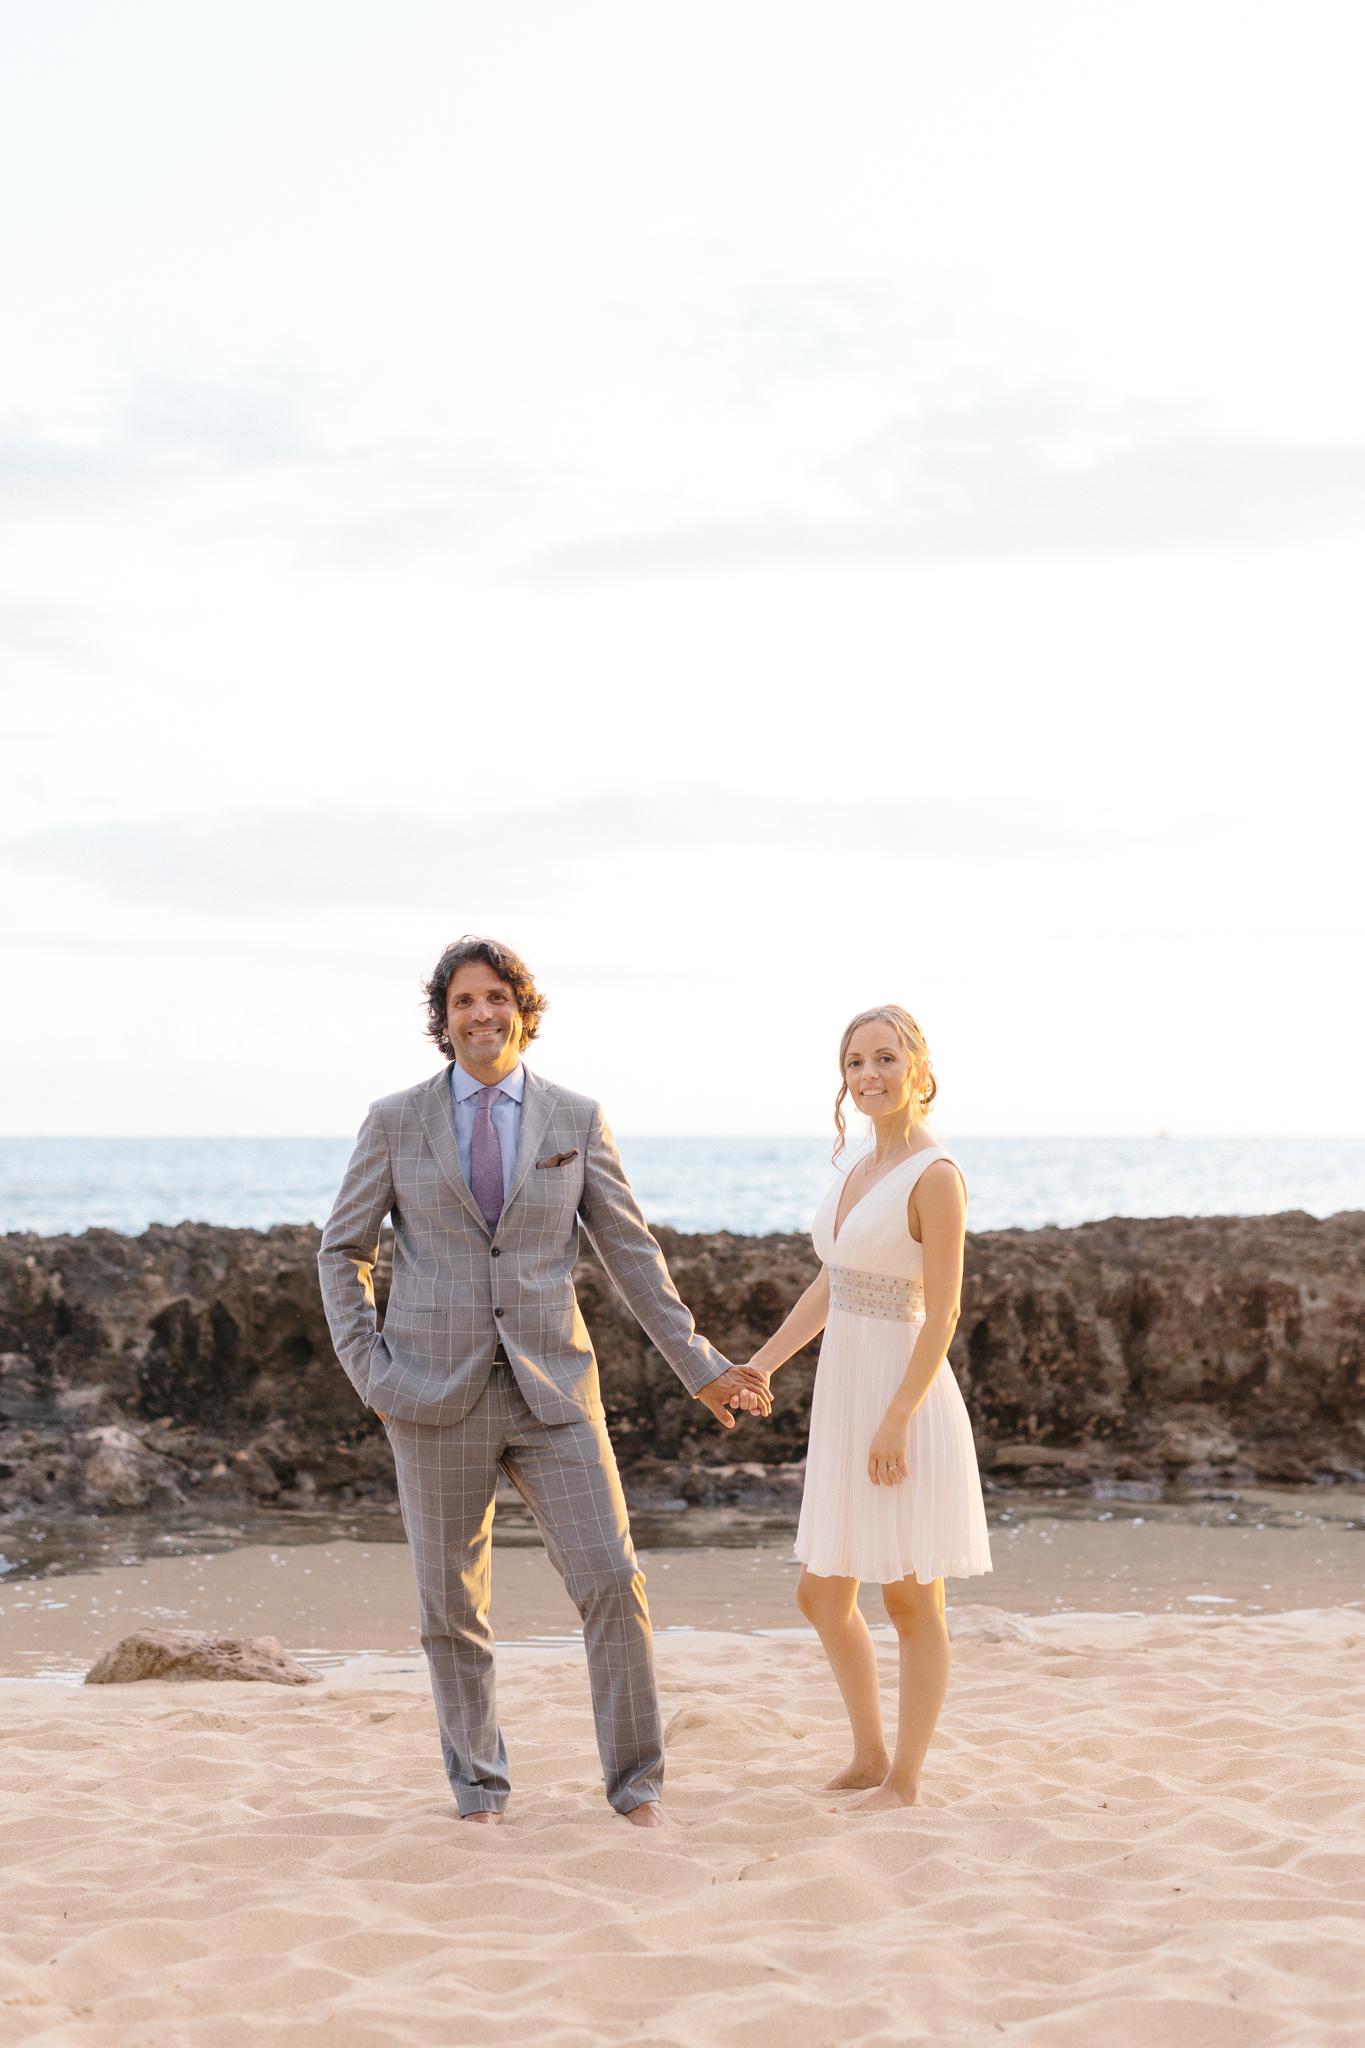 oahu-wedding-photographer-tone-6.jpg